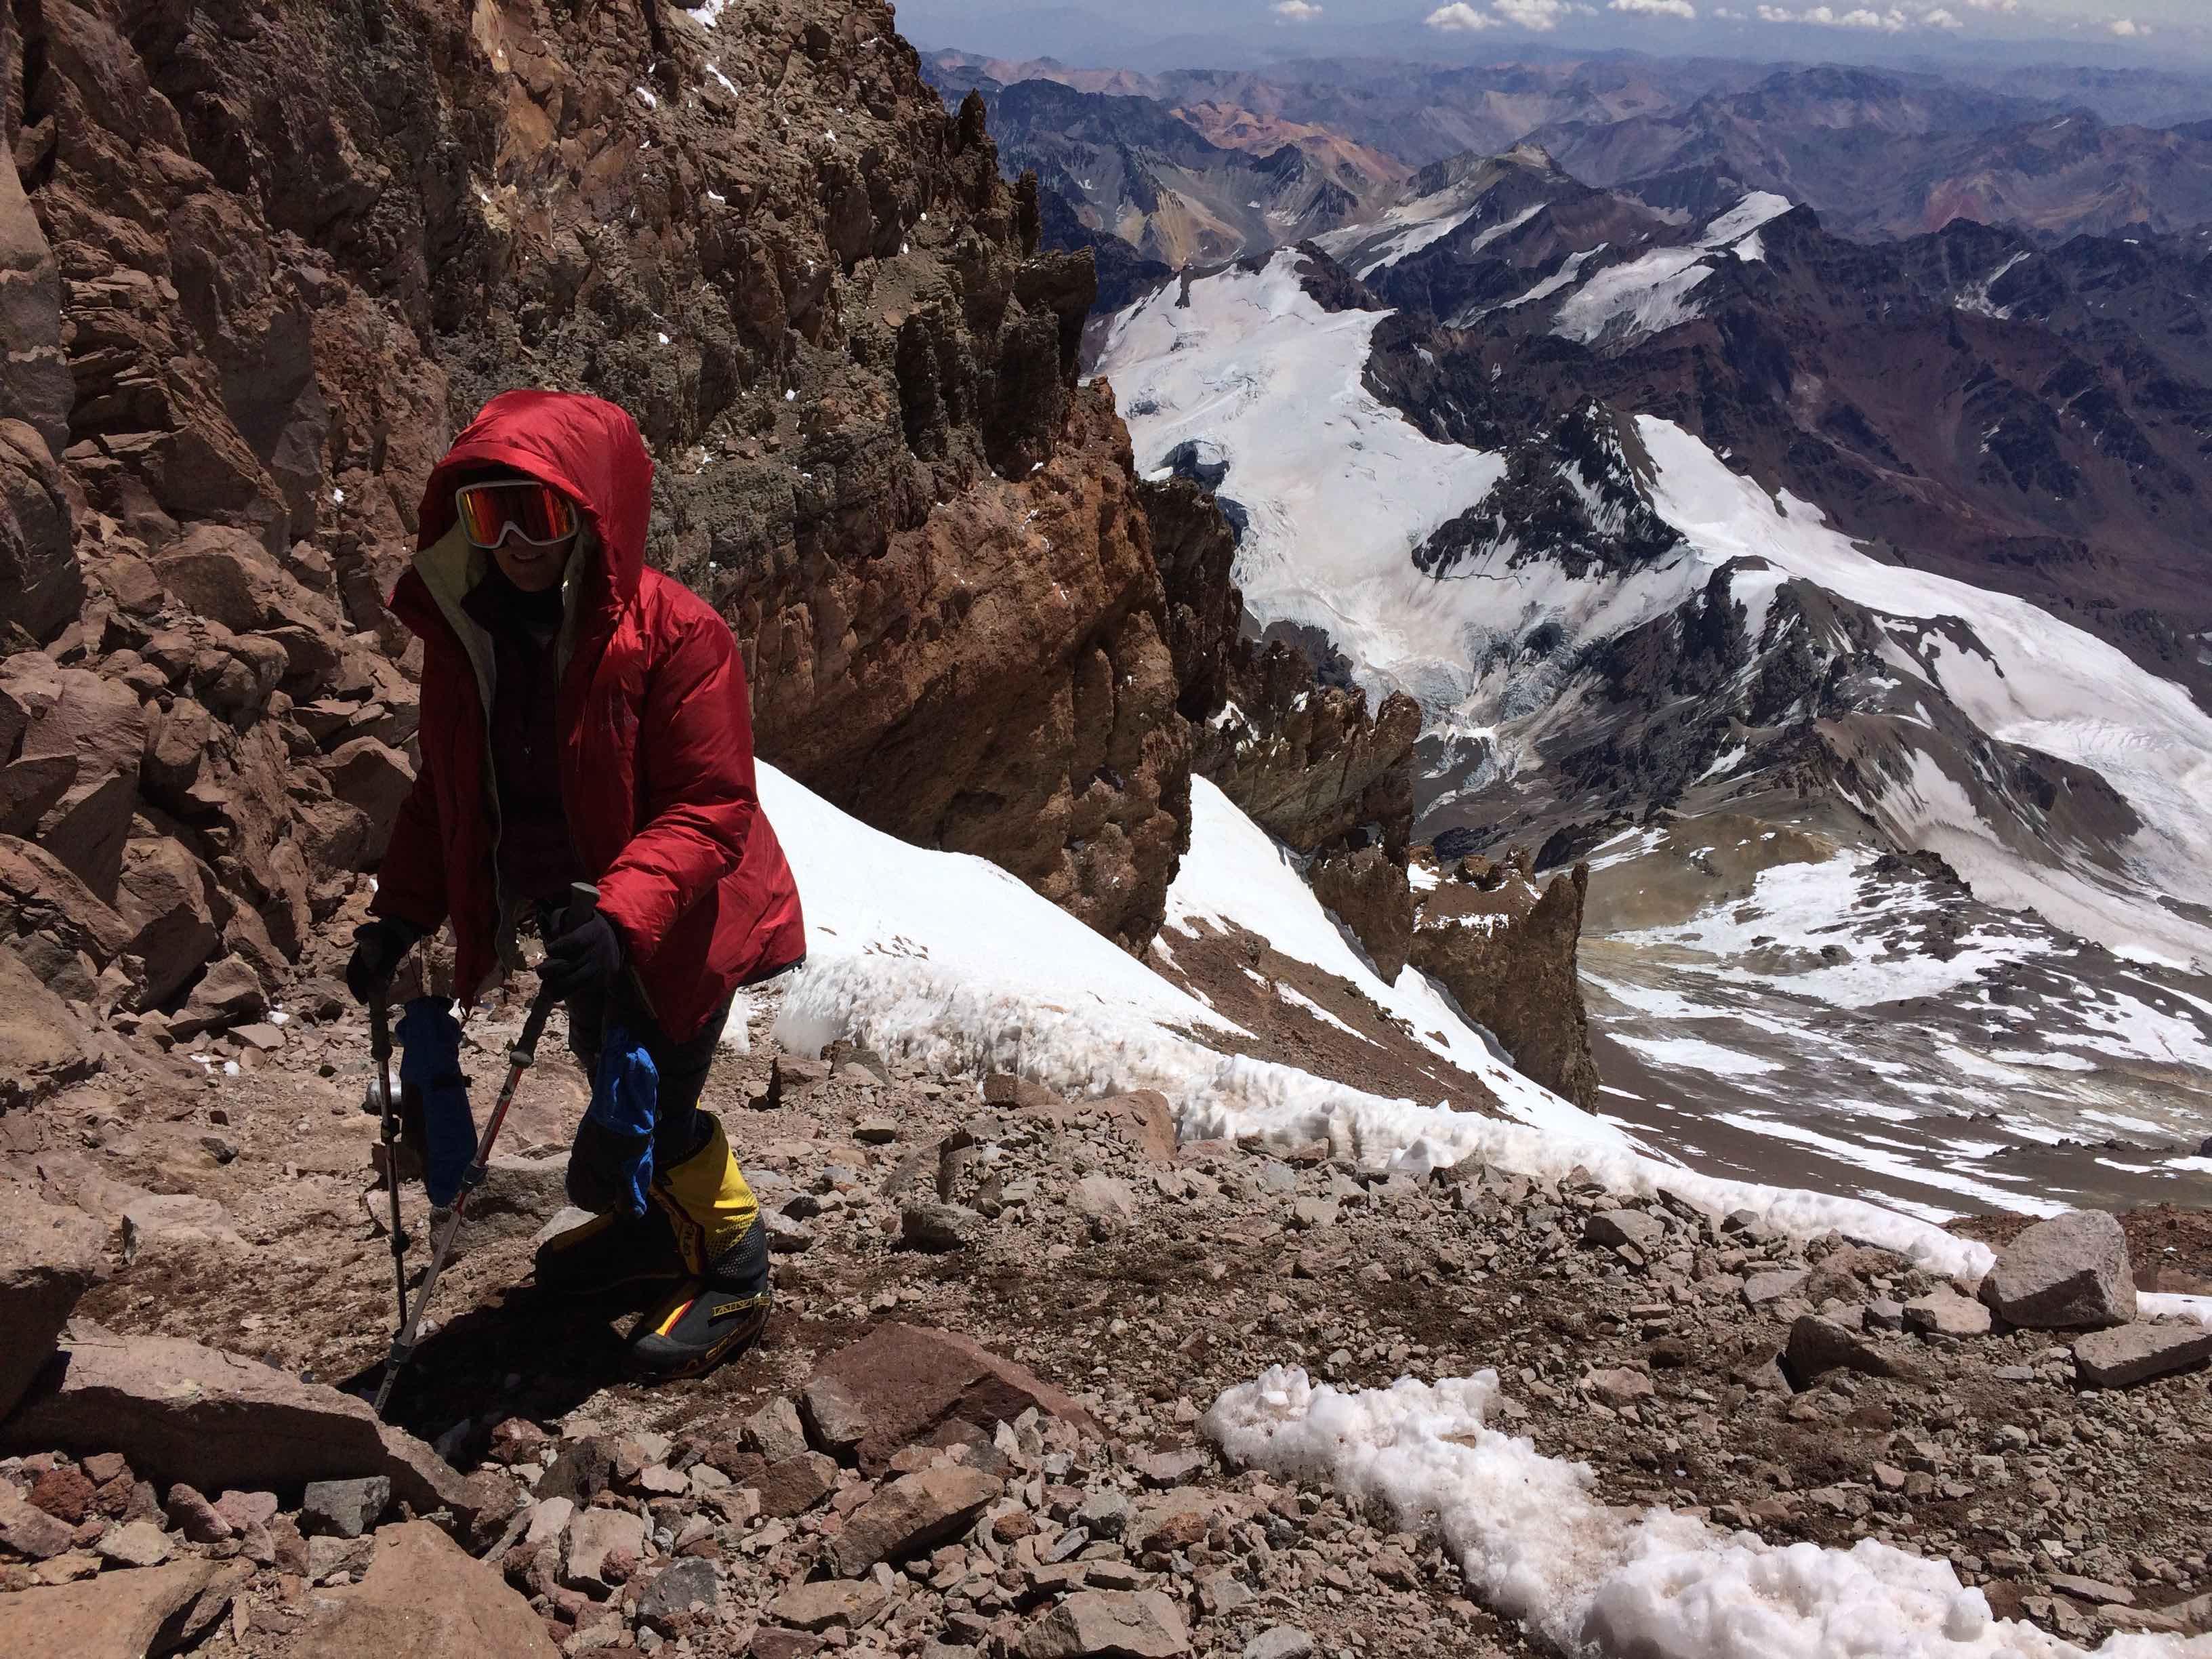 Karin on Aconcagua via the 360 route